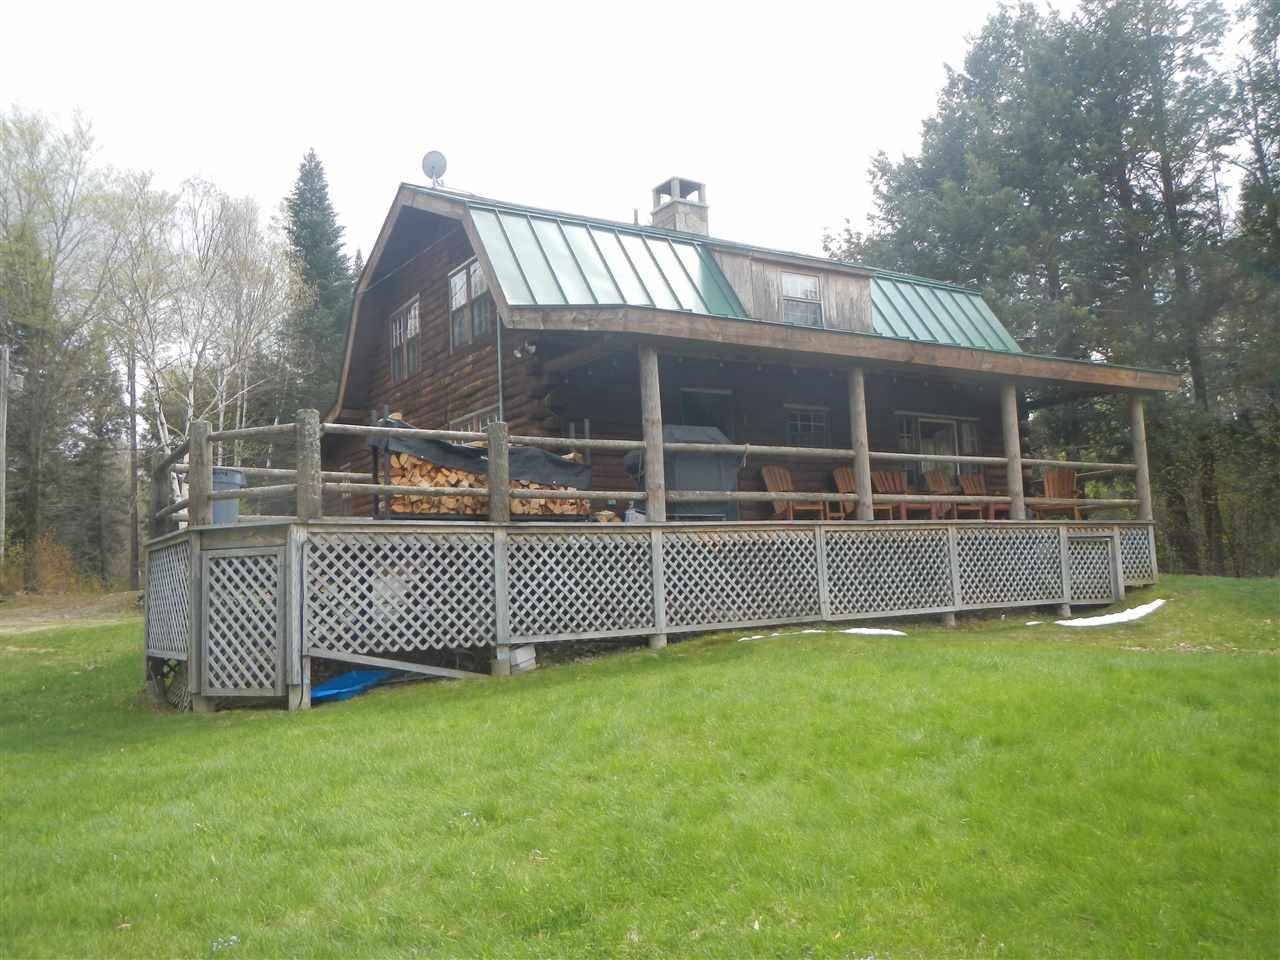 Mount-Snow-Real-Estate-4633923-0